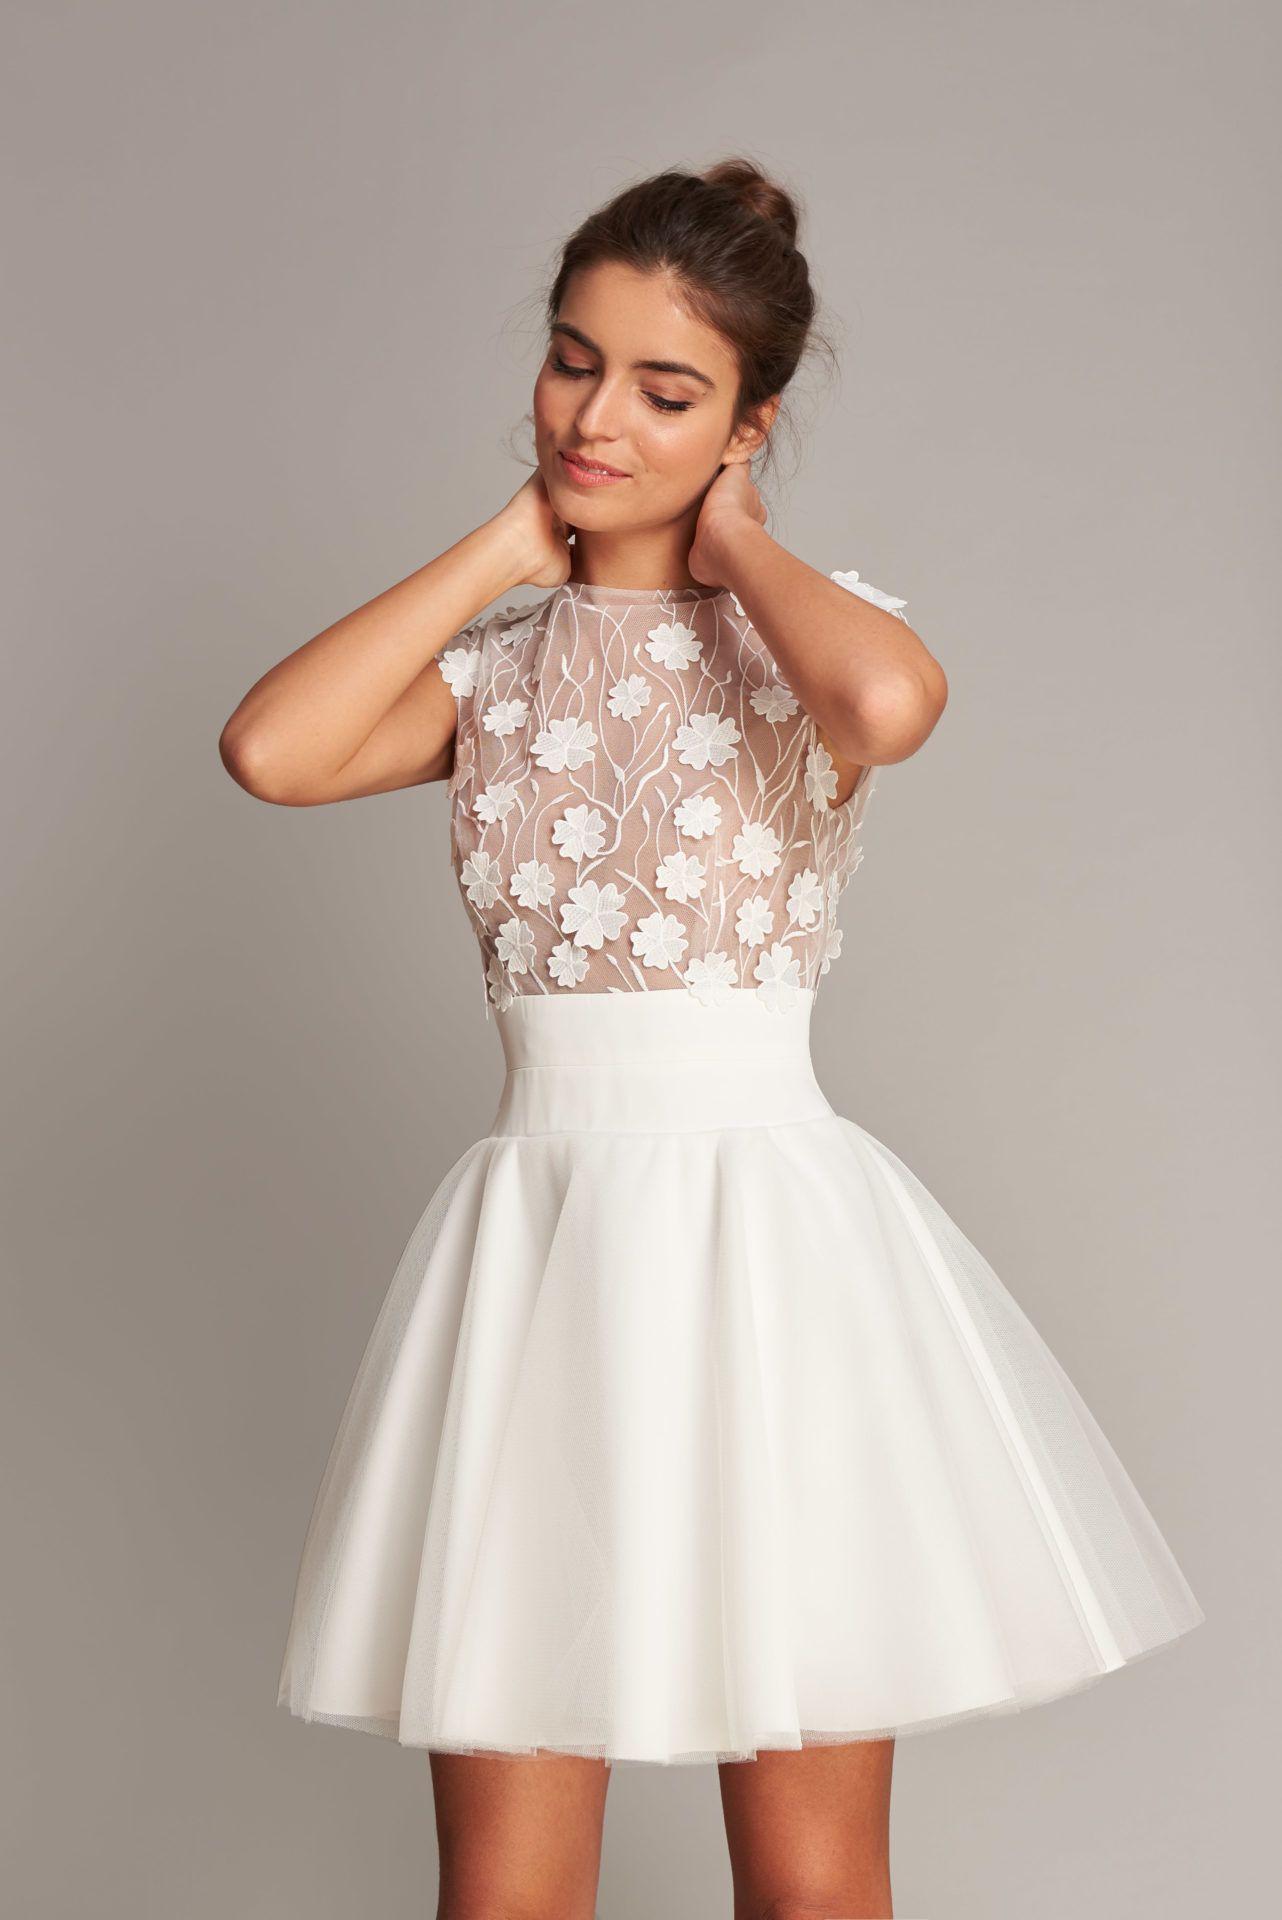 Spitze Brautkleid Fabienne Alagama In 2020 | Hochzeitskleid